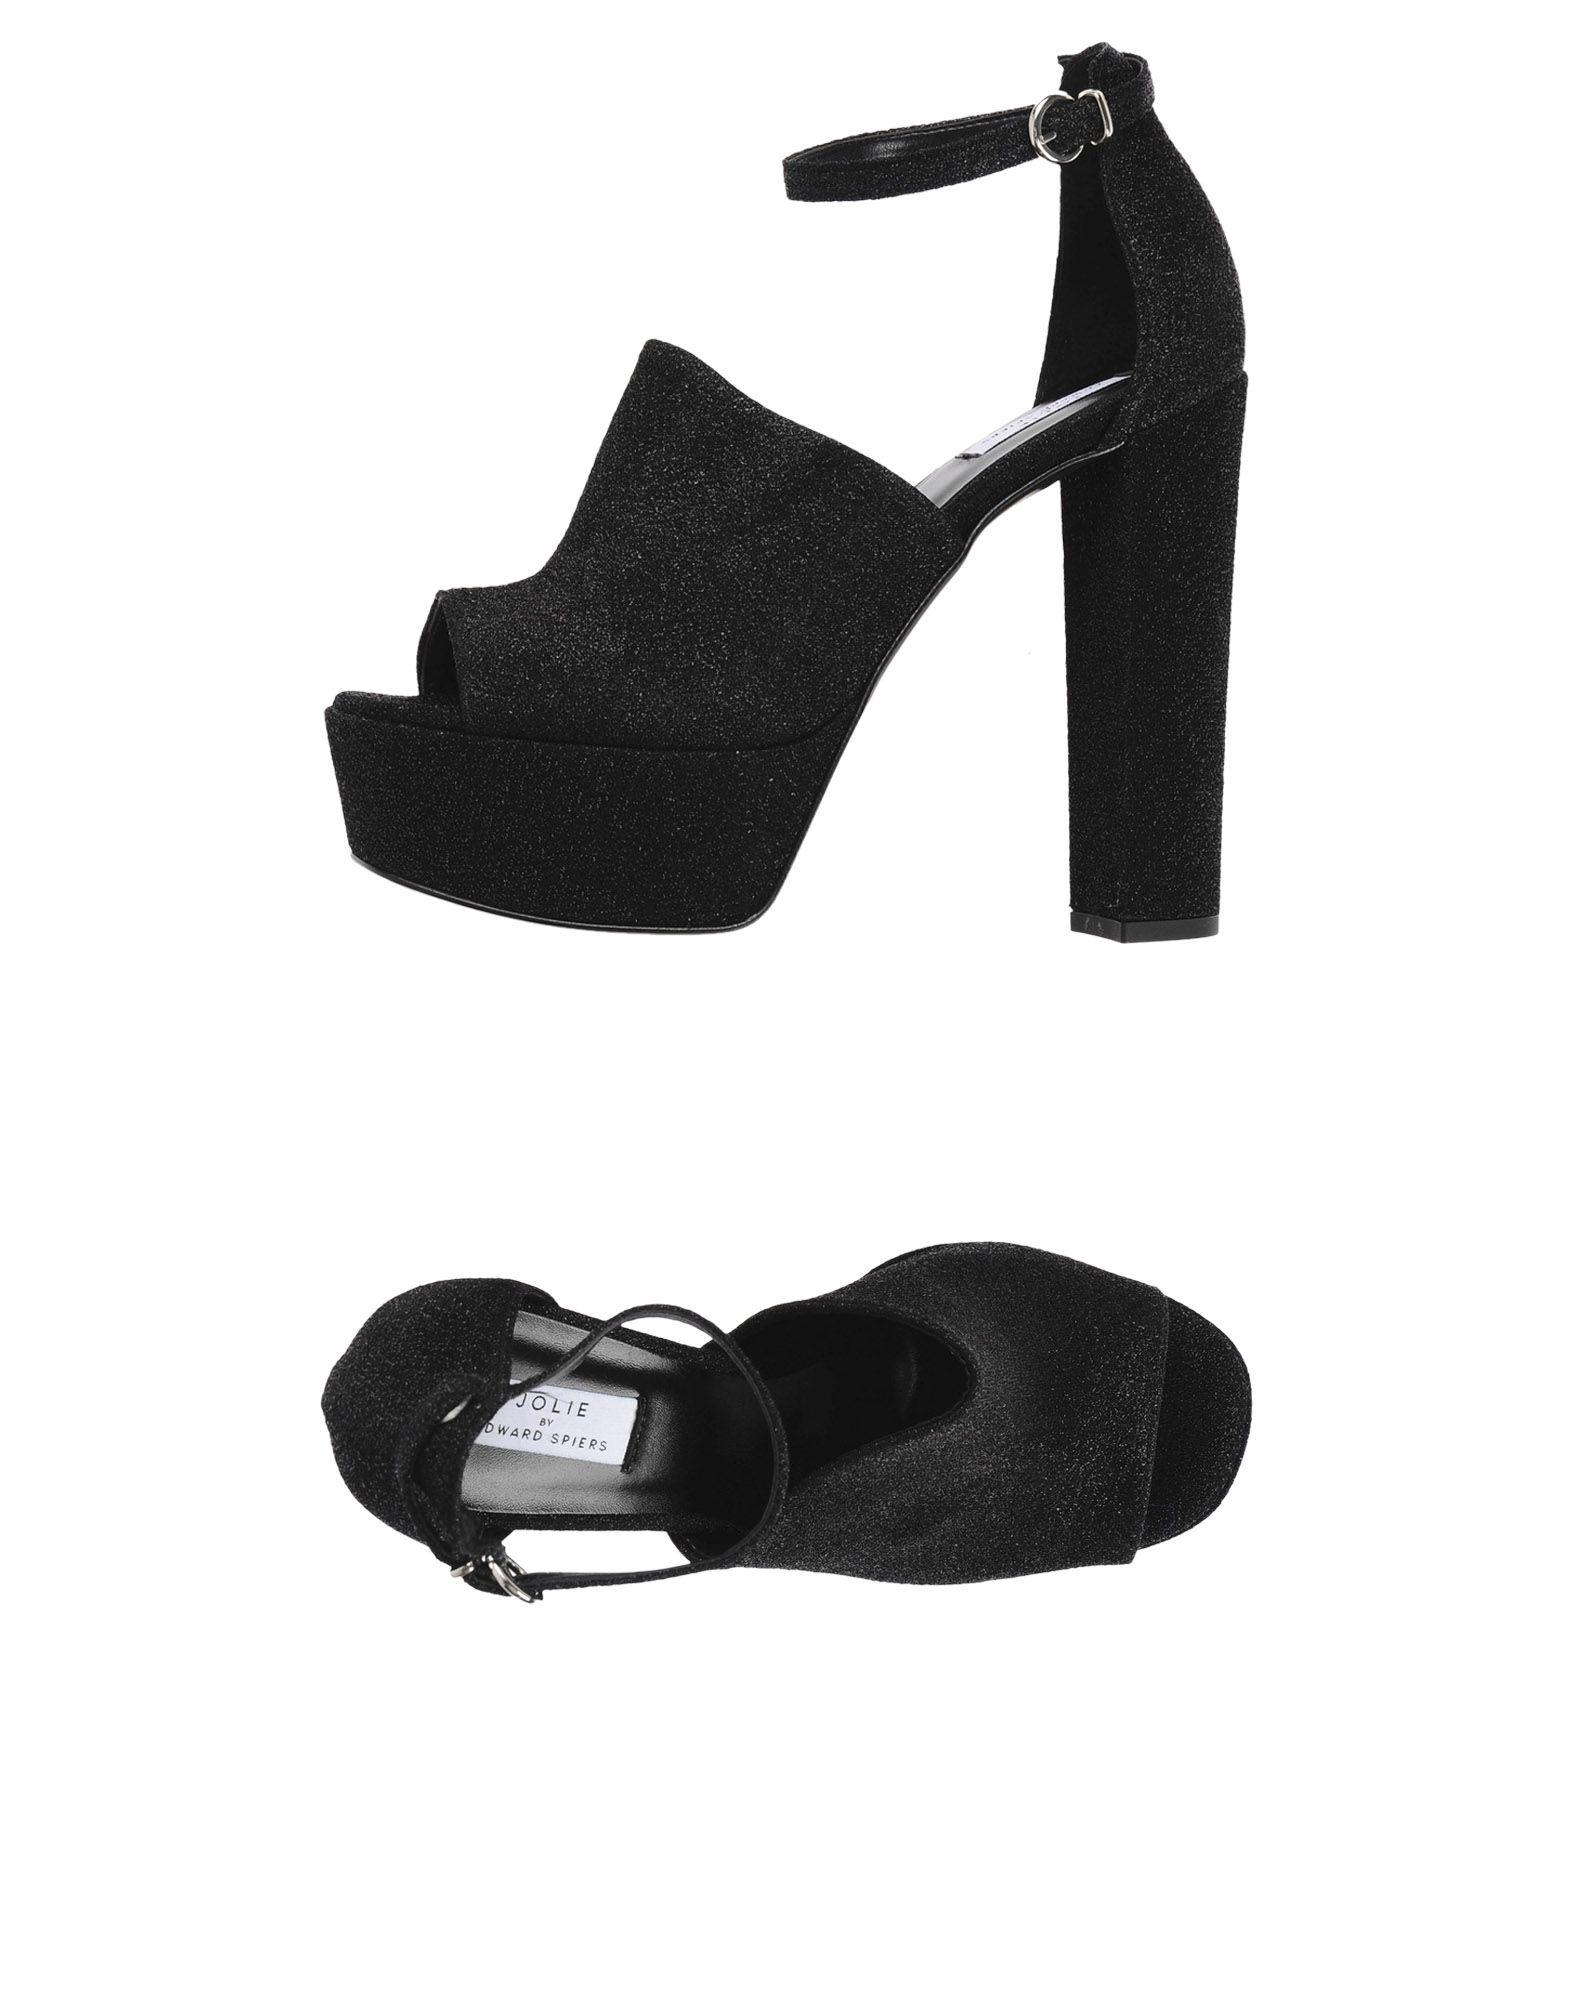 Jolie By Edward Spiers Sandalen Damen  11453020UP Gute Qualität beliebte Schuhe